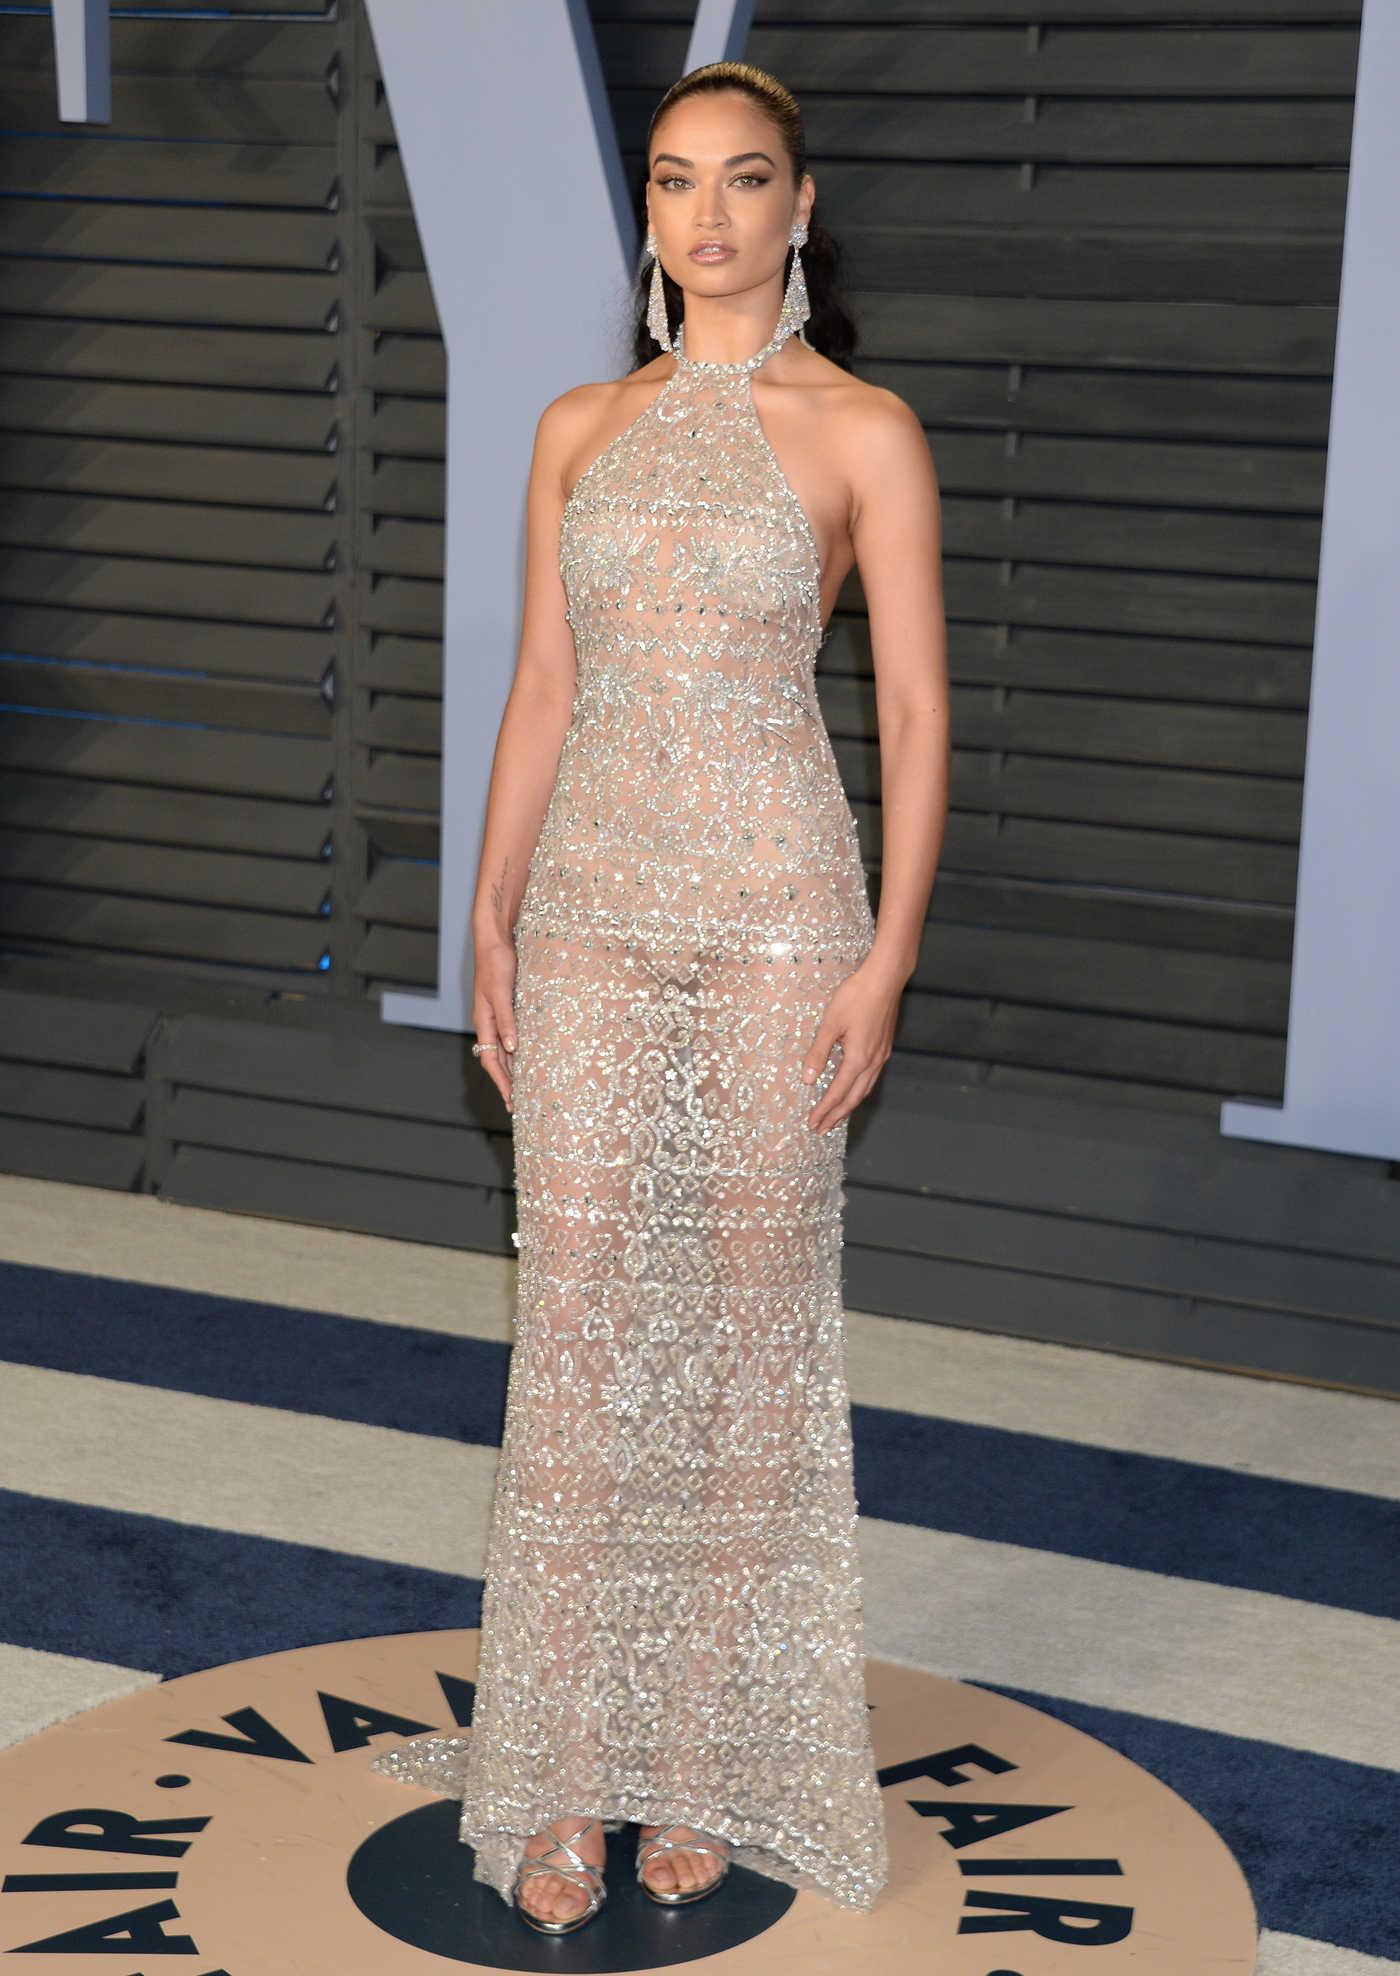 Shanina Shaik at 2018 Vanity Fair Oscar Party in Beverly Hills 03/04/2018